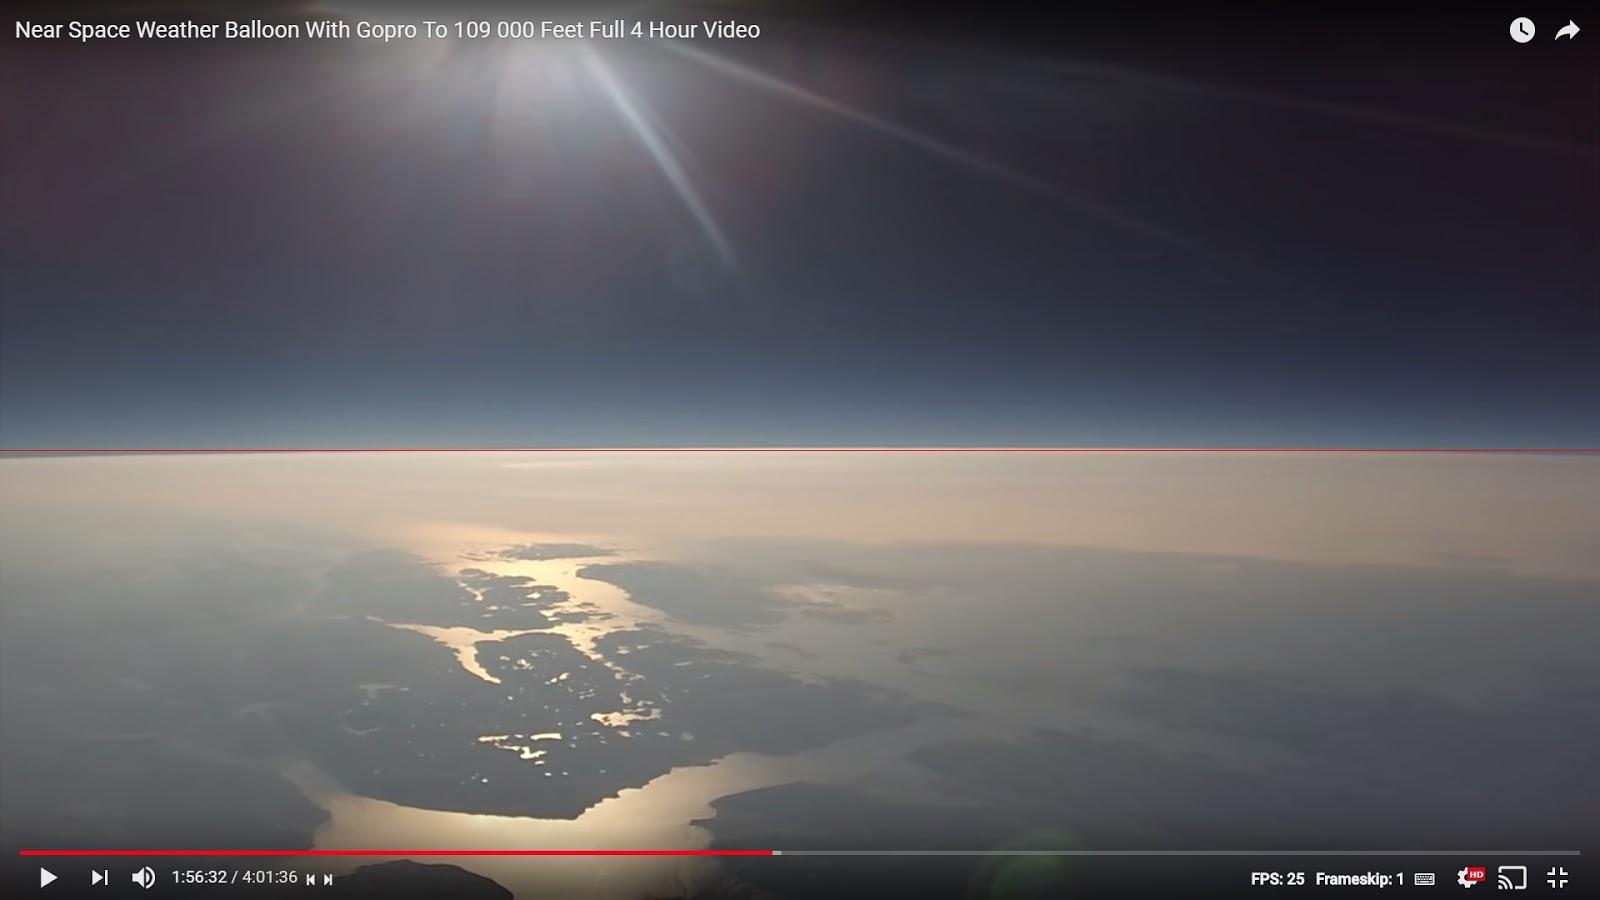 Flat Earth Insanity: Flat Earth Lies: A fisheye lens can not